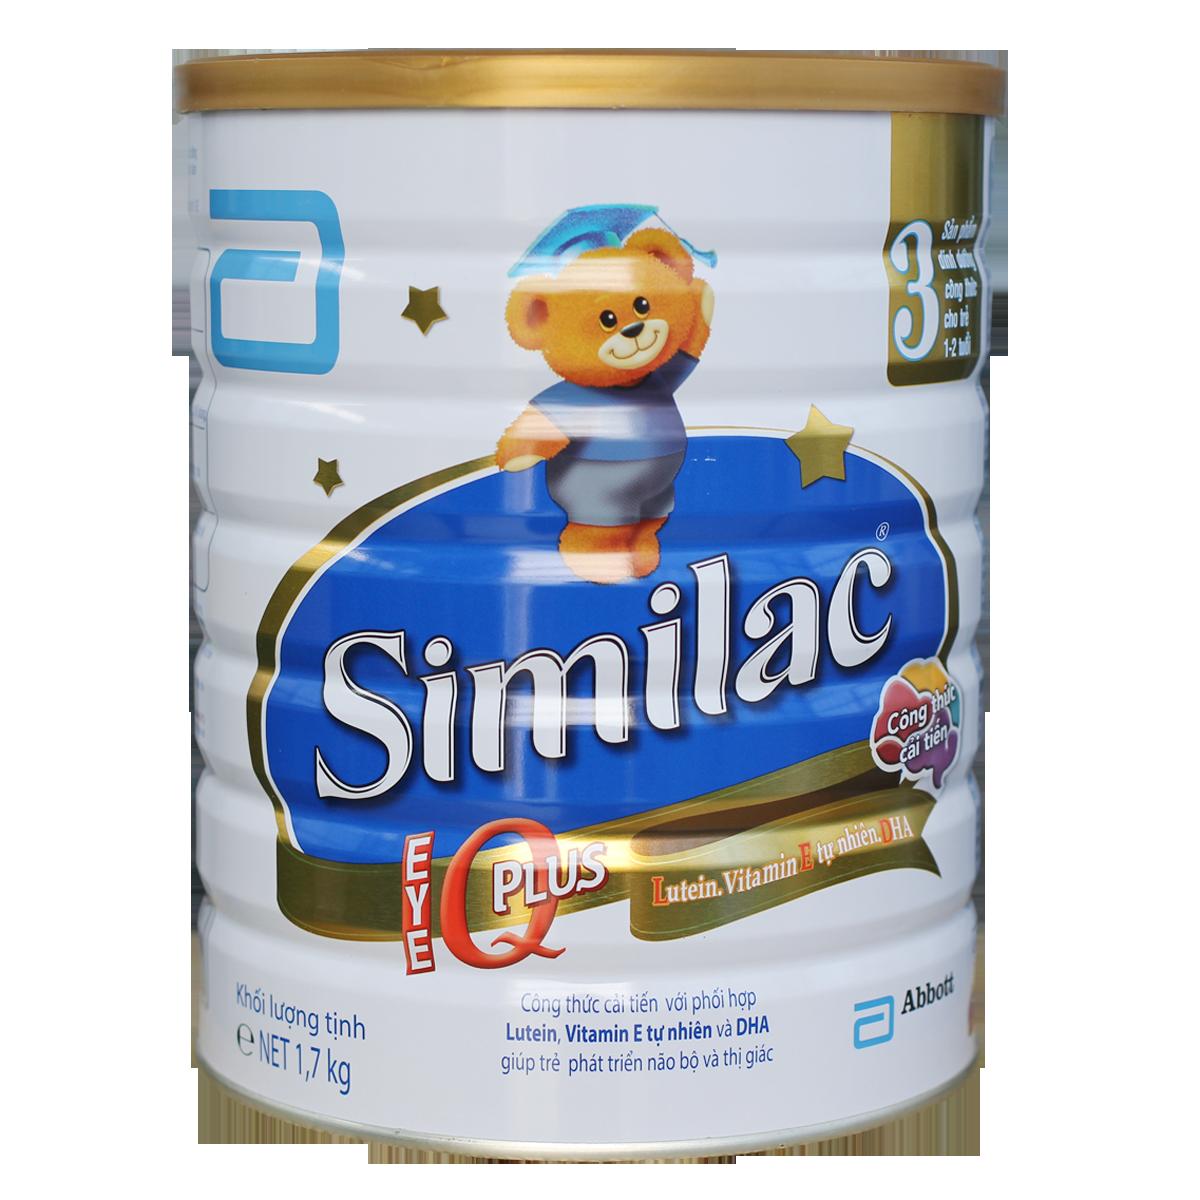 Sữa Similac Gain IQ Plus 3  - 1,7kg (1-2 tuổi)